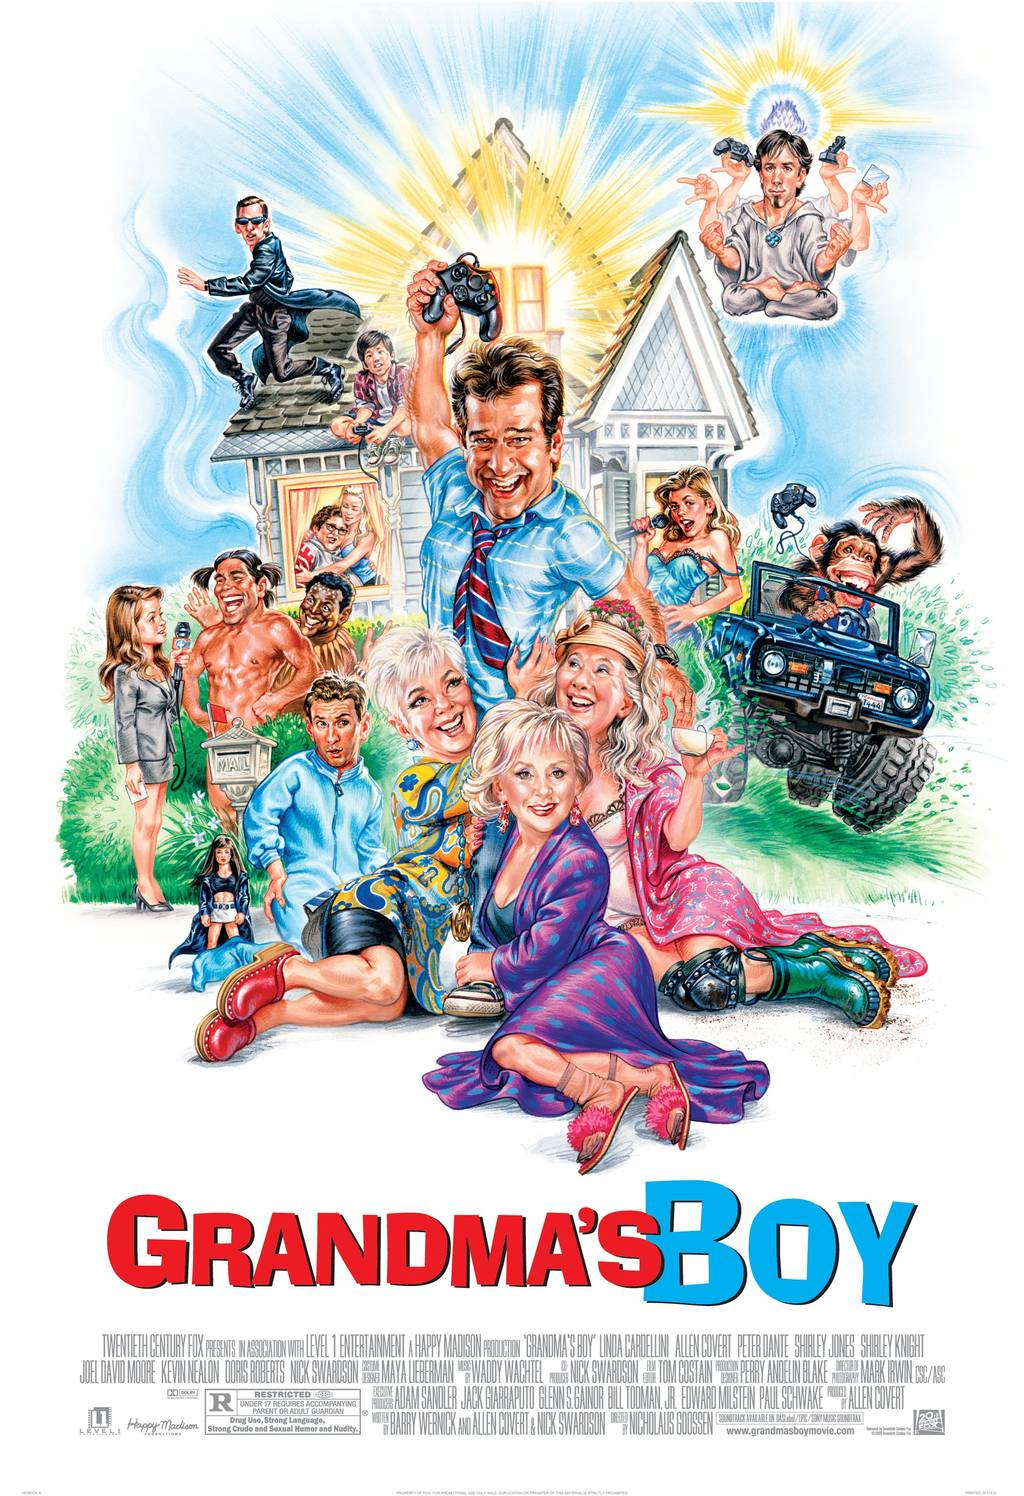 Grandma s boy nude scene — img 4